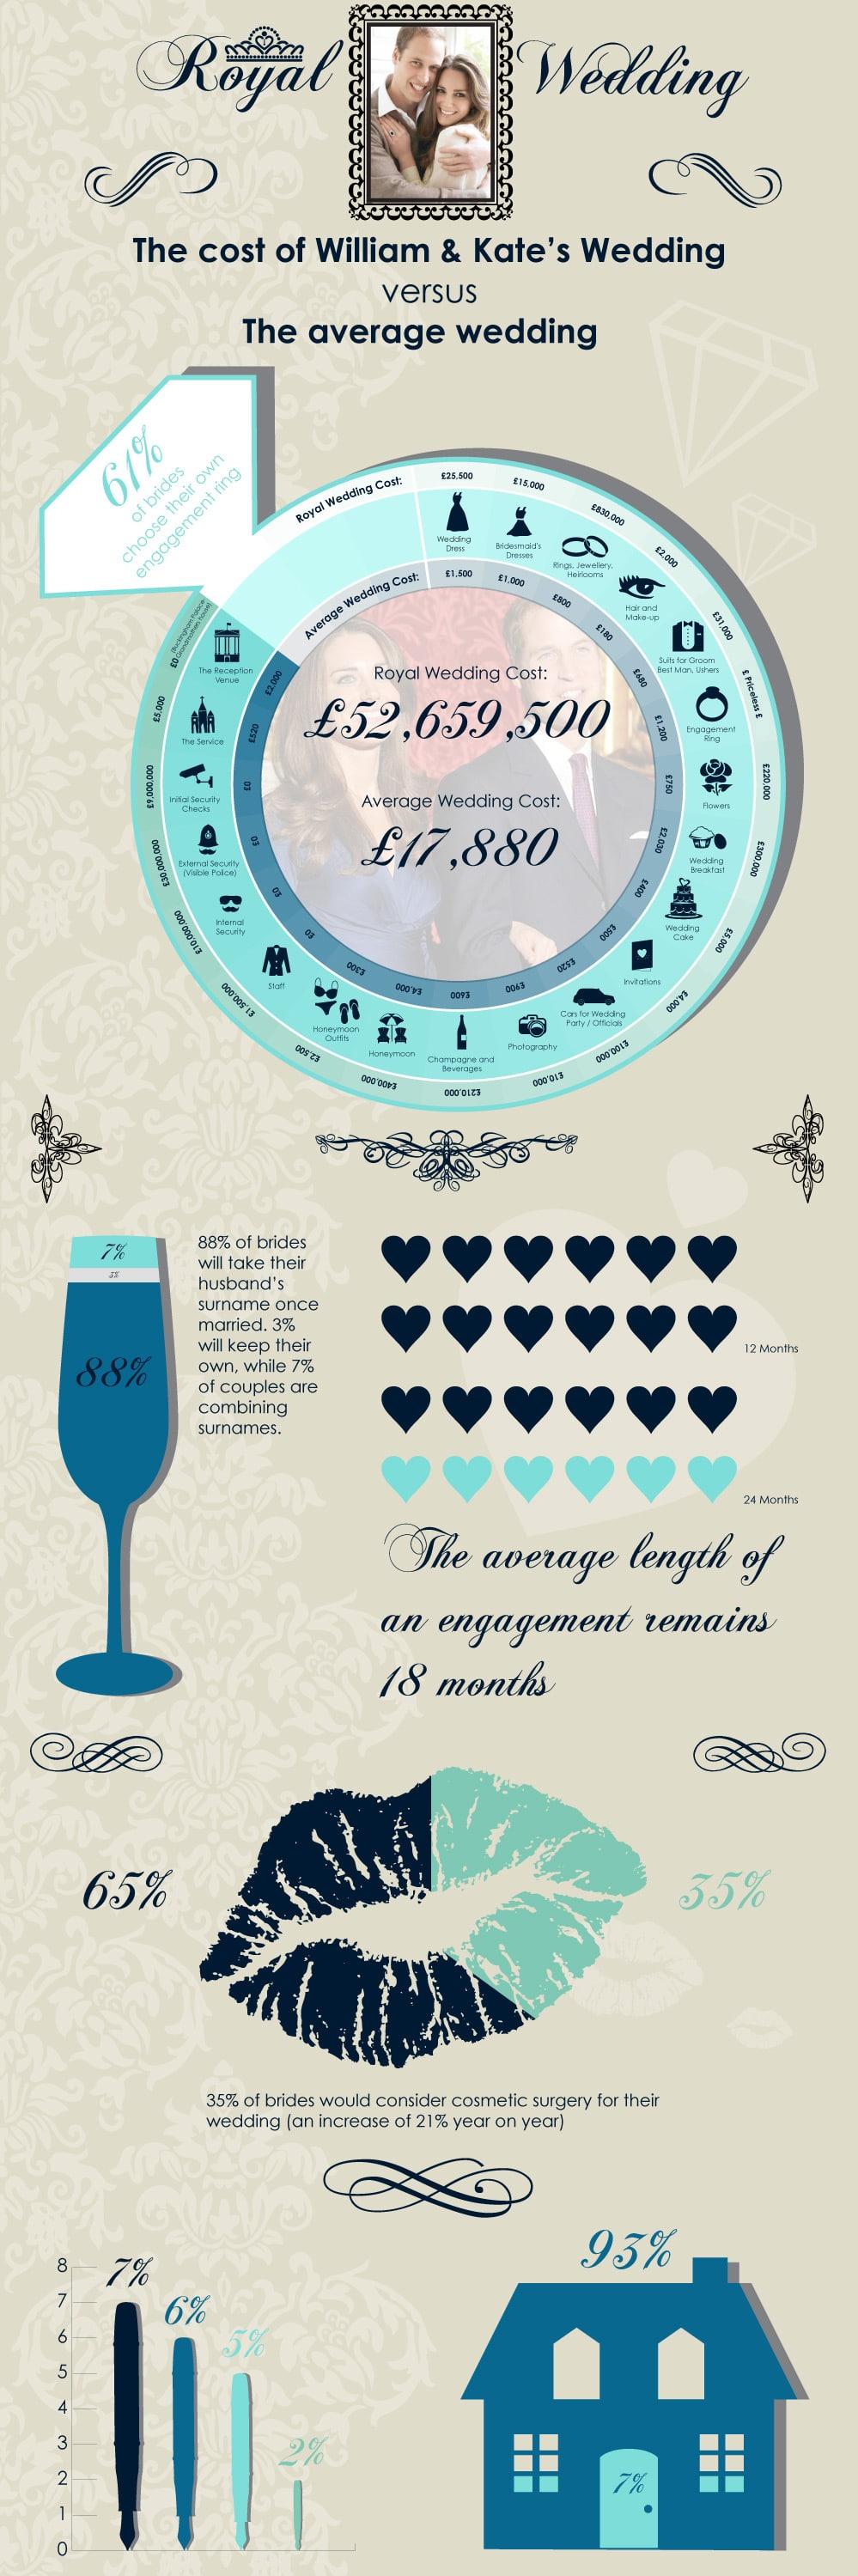 The Royal Wedding Statistics Infographic